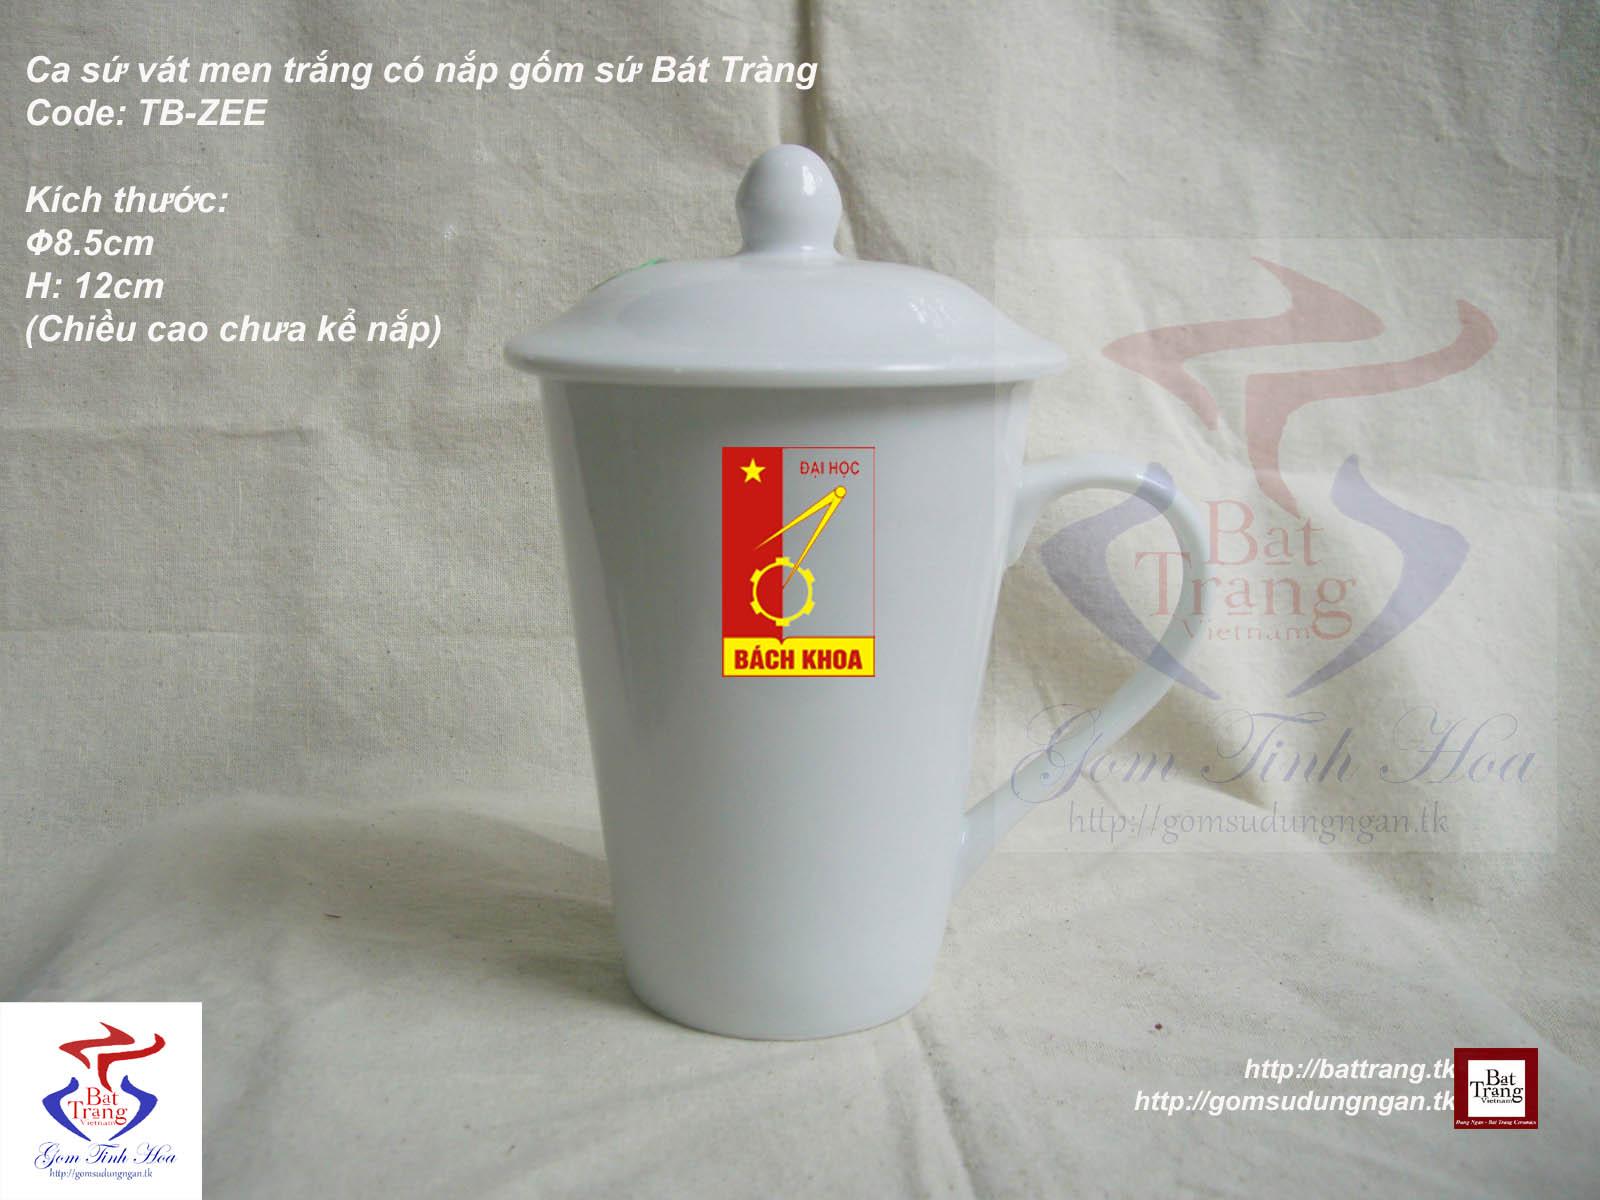 trang+co+nap+in+logo+Qua+tang+Hoi+nghi+Cong+ty+TNHH+Bat+Trang+Gom+Tinh